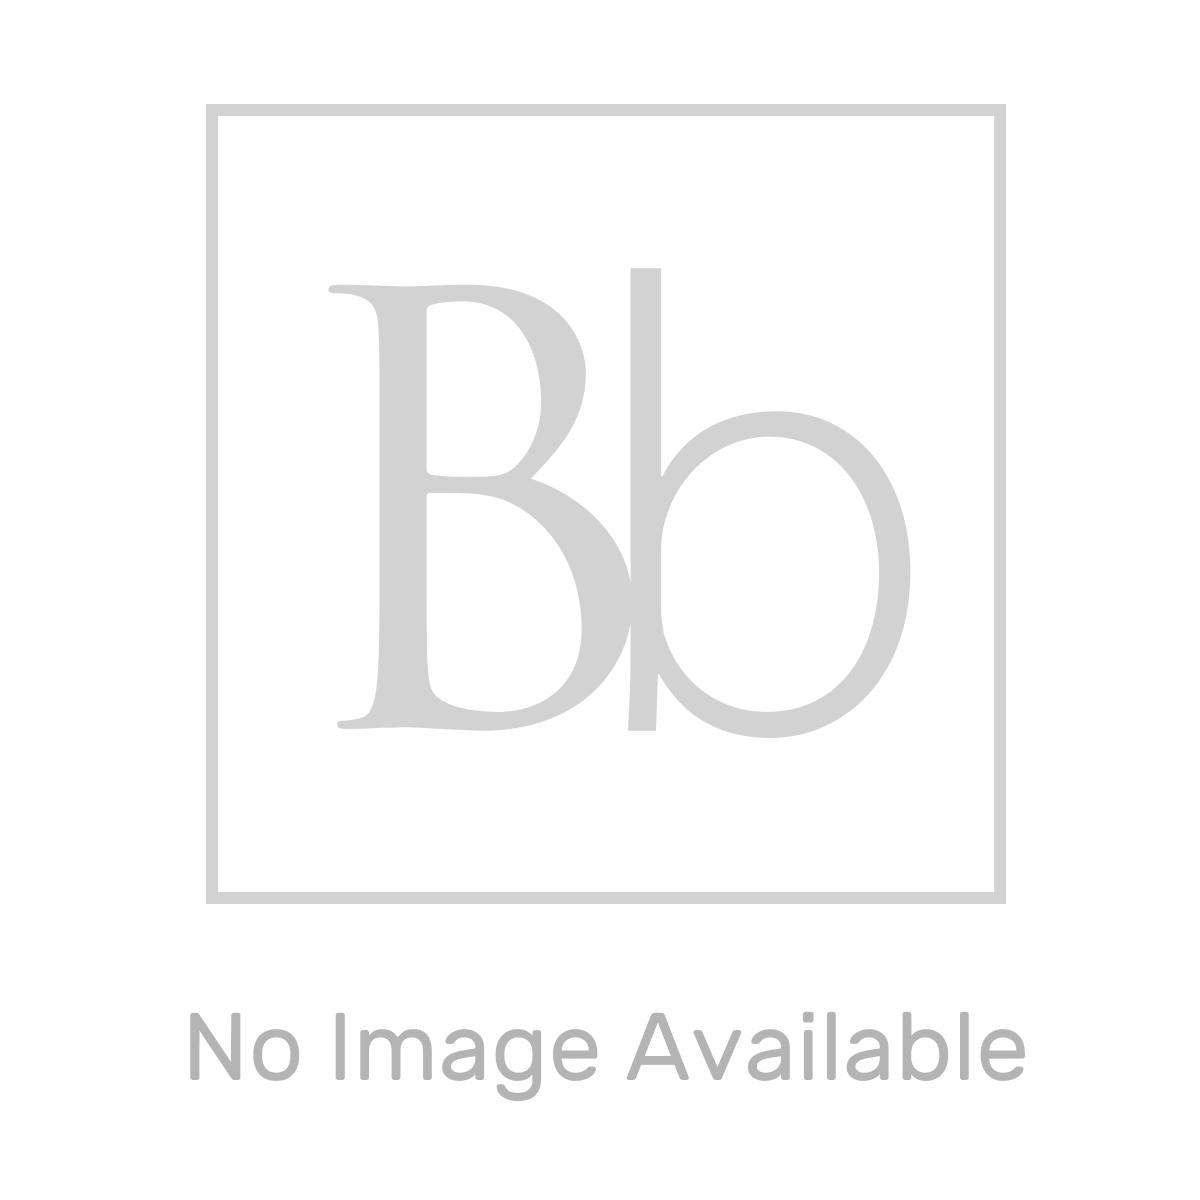 McAlpine WC-EXTA 4